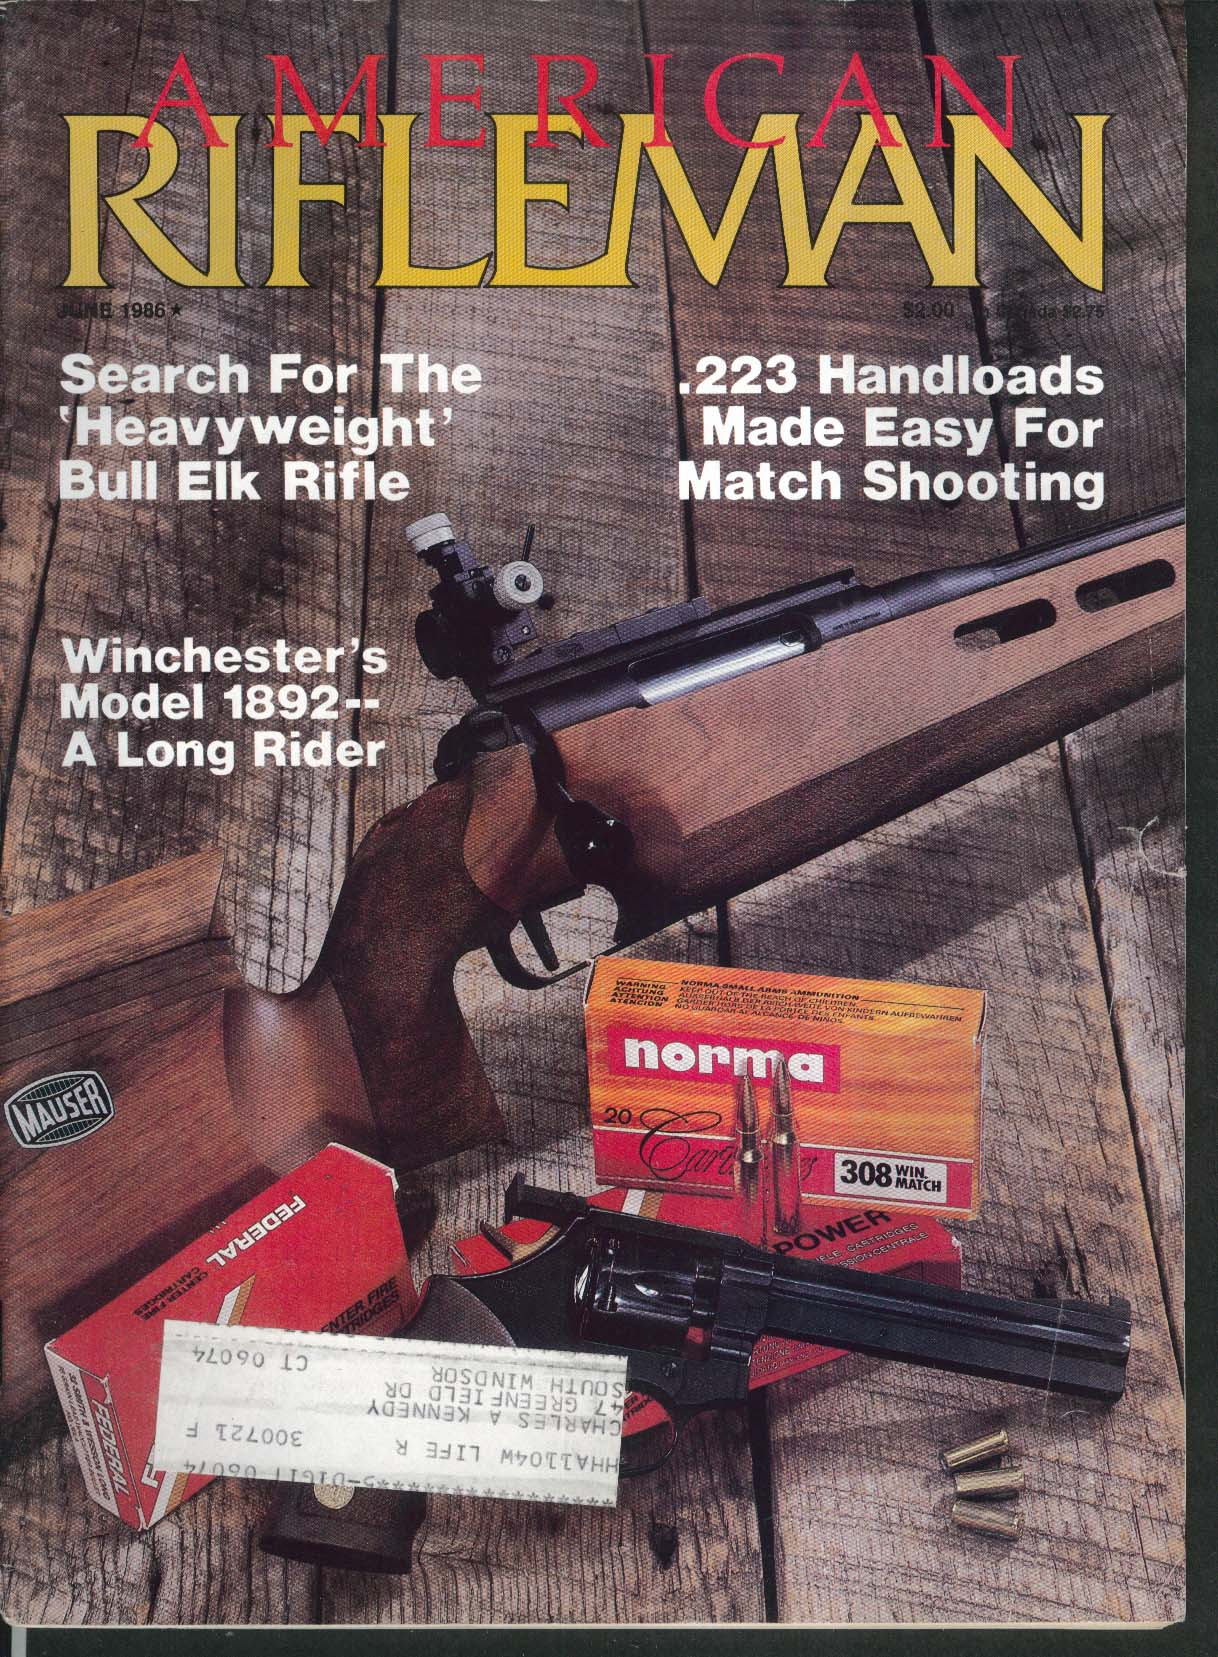 AMERICAN RIFLEMAN Bull Elk Rifle 223 Handloads Winchester 1892 6 1986